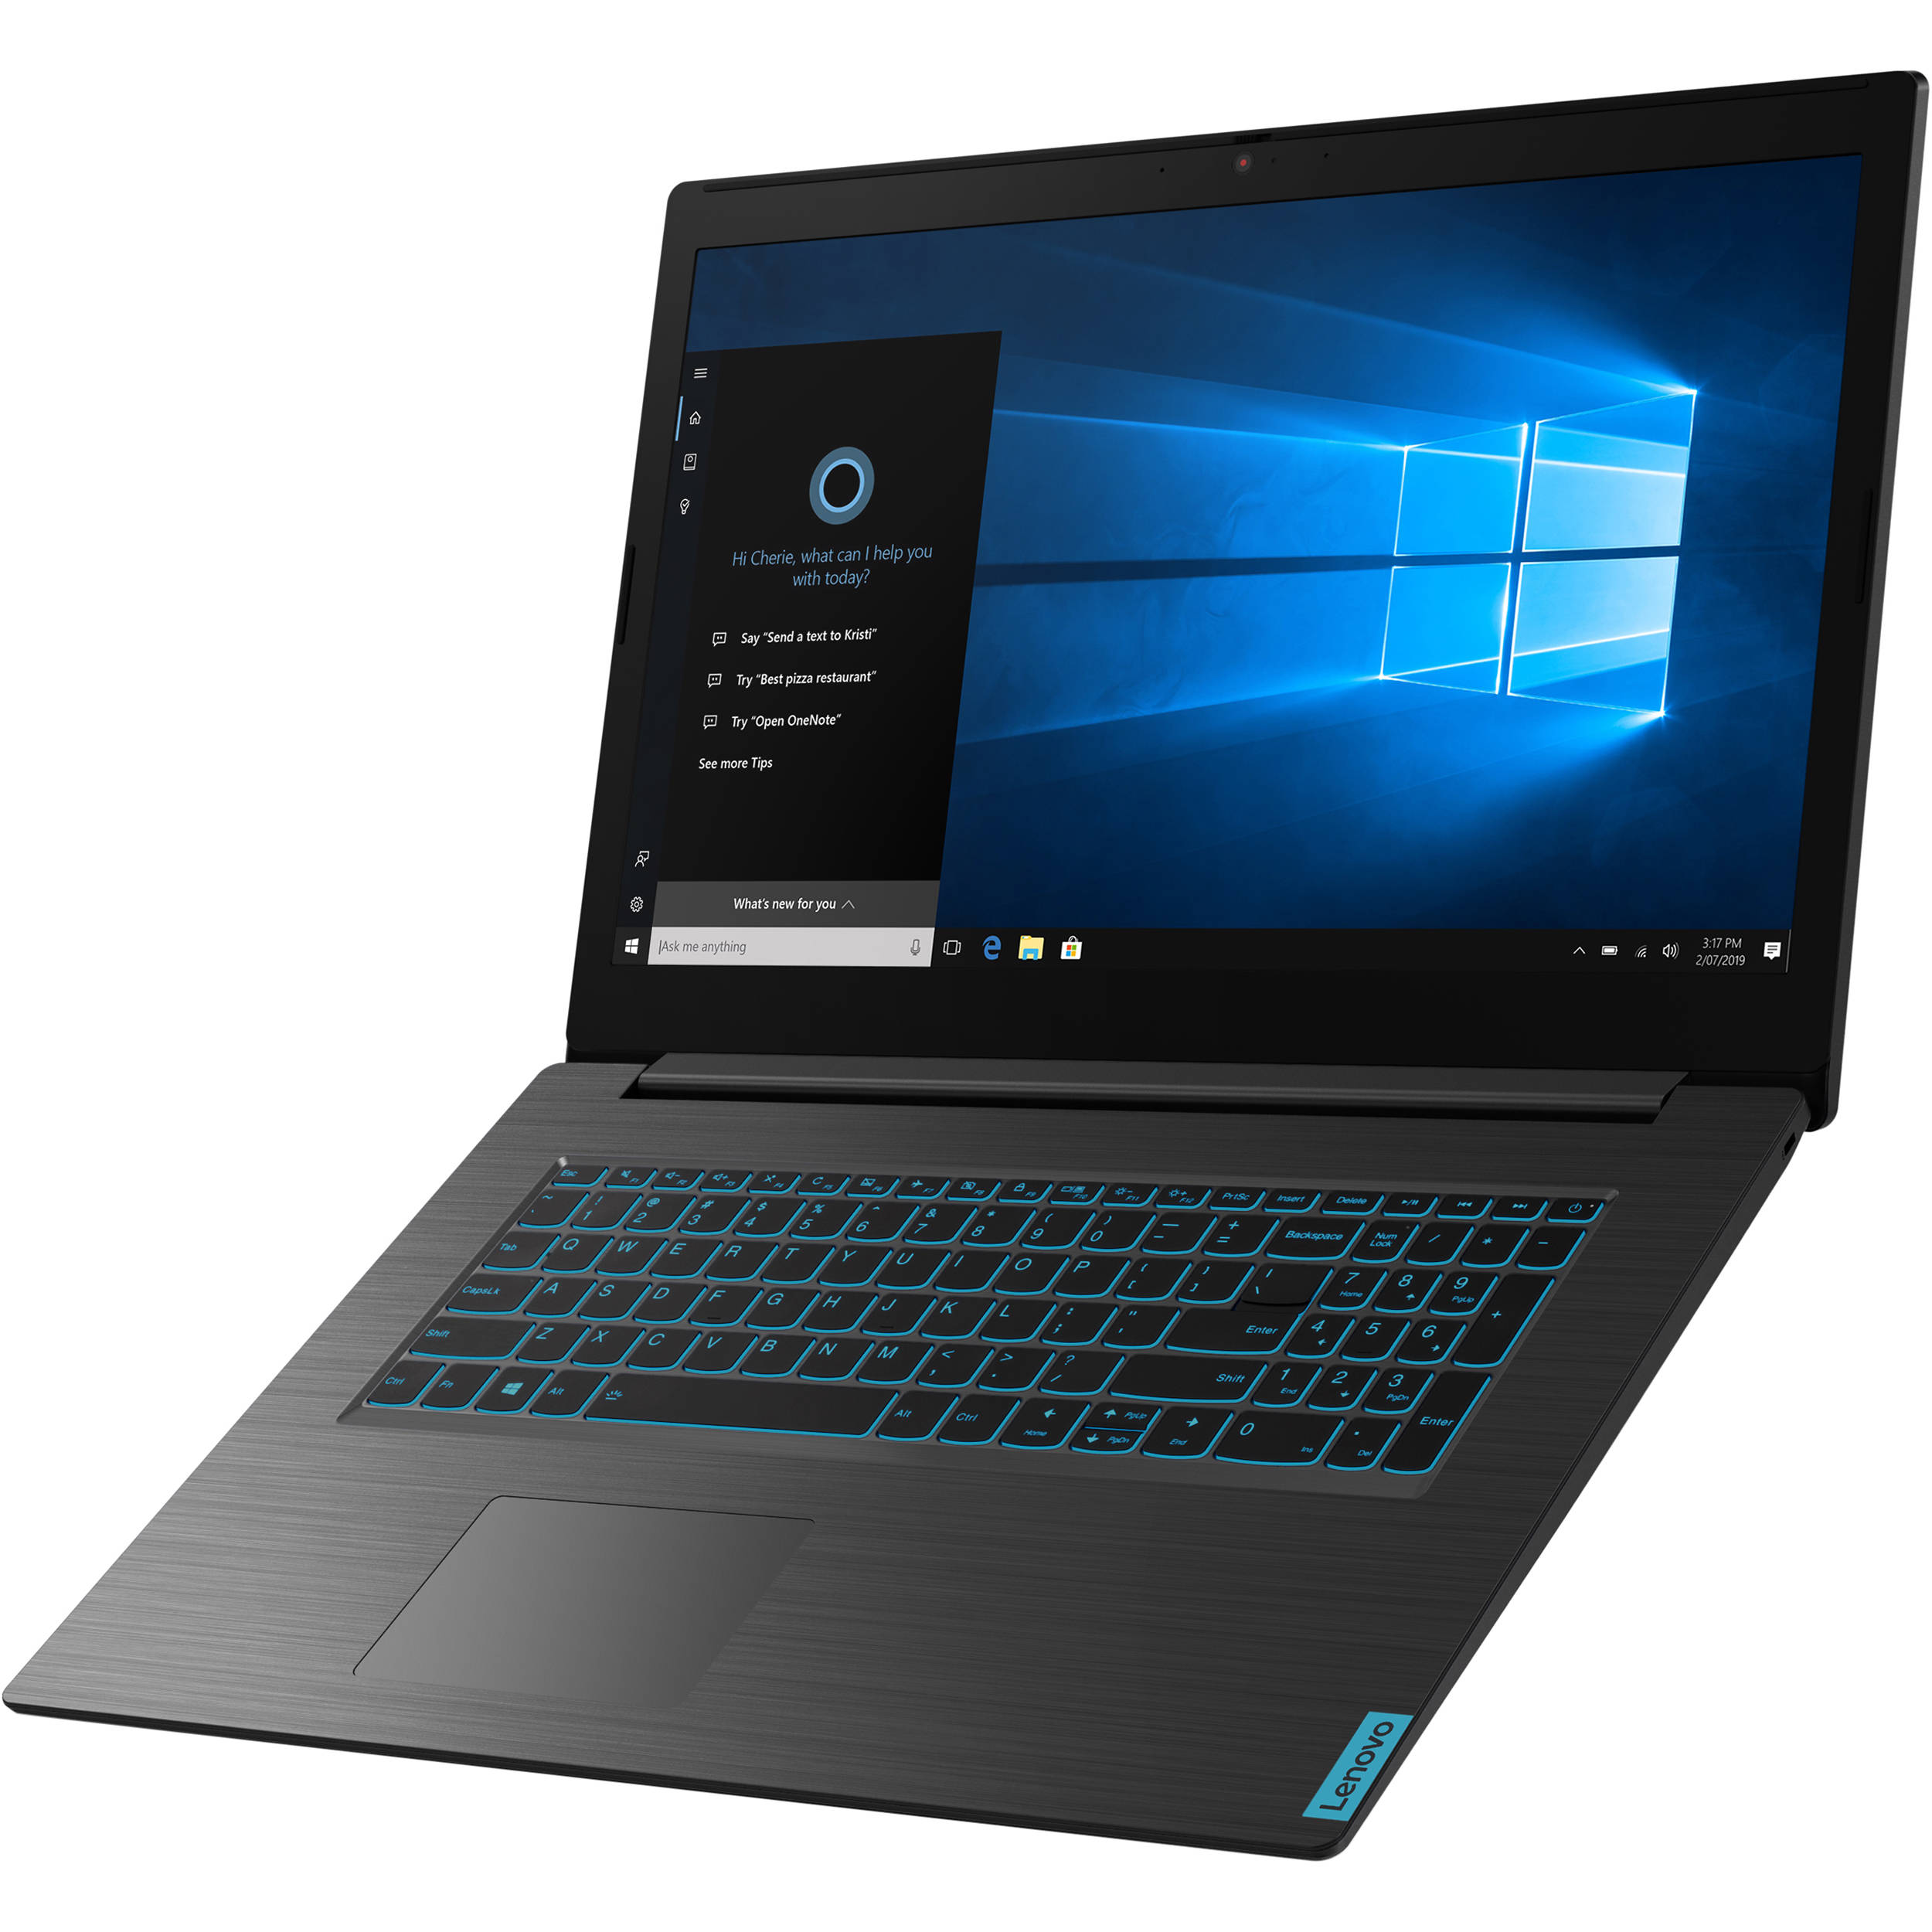 NOTEBOOK LENOVO L340 I7 9750H 2.6 UP TO 4.5 12M 16G DDR4 1T+256SSD VGA NVIDIA 4G GTX1650 DDR5 15.6 FULL HD BLACK ,Laptop Pc